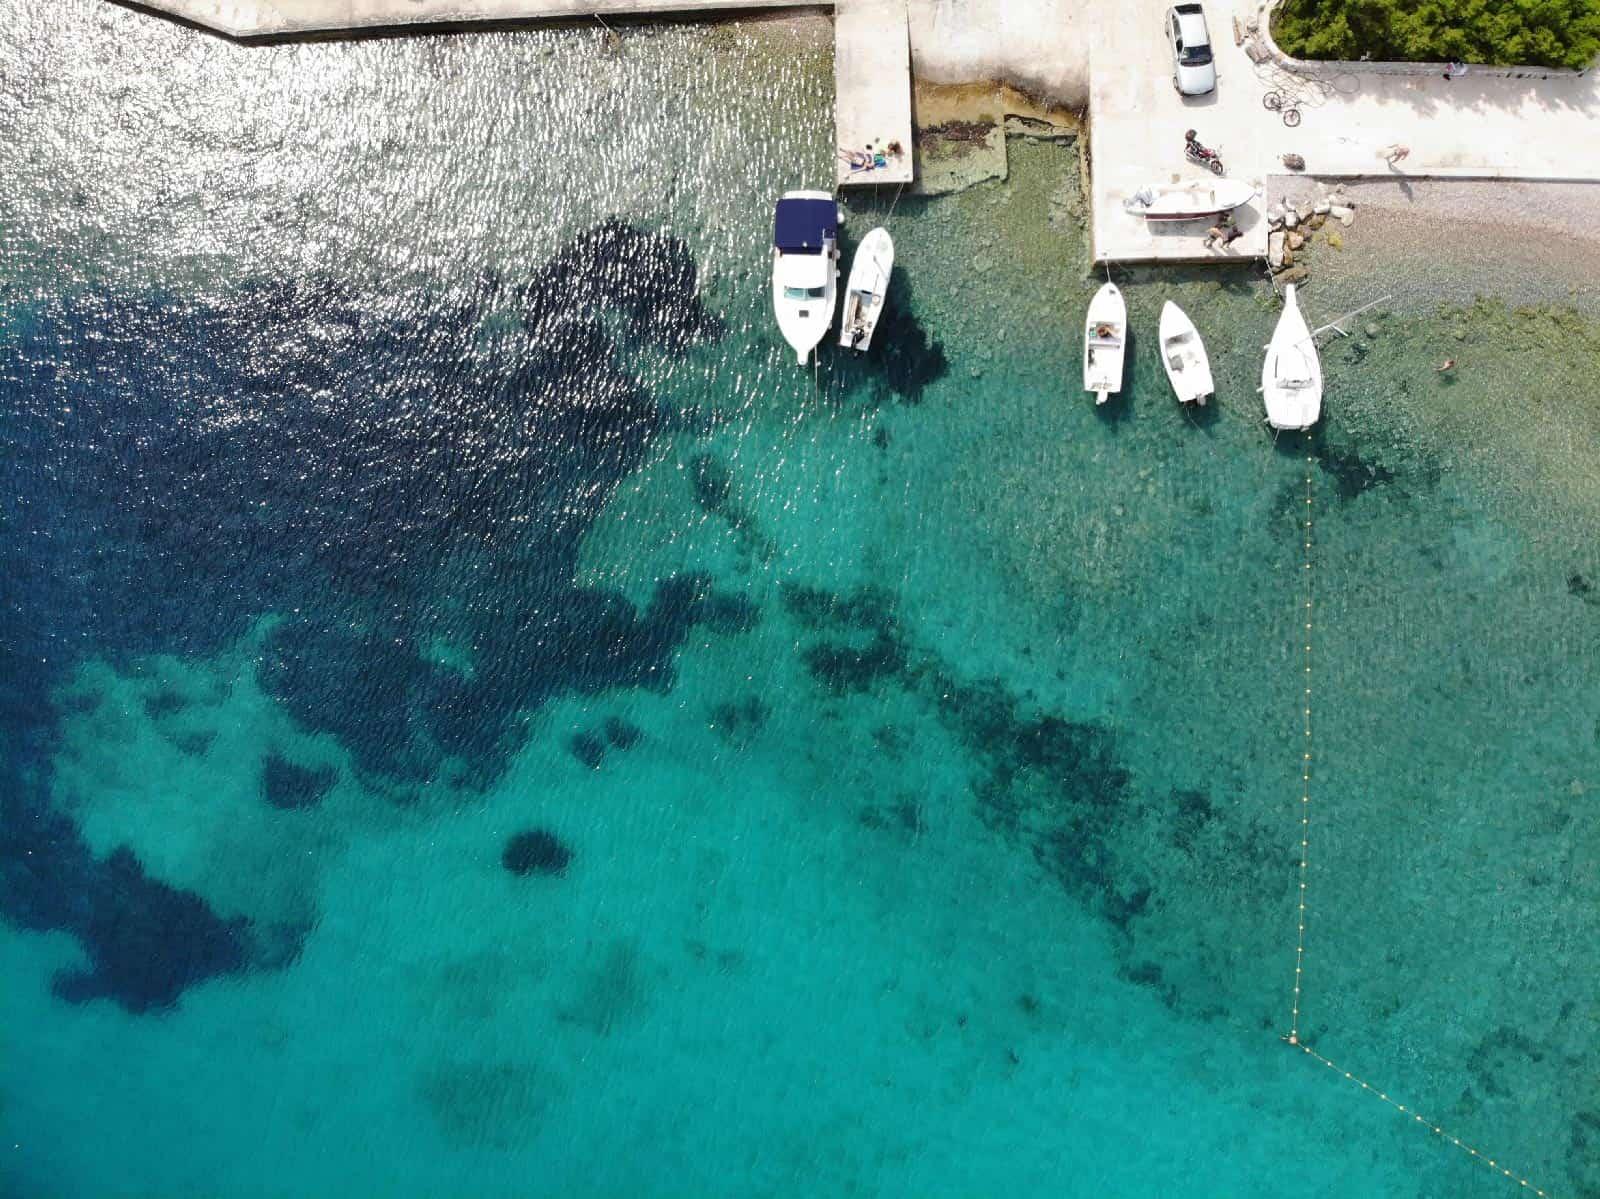 sipan island dubrovnik croatia adriatic sea